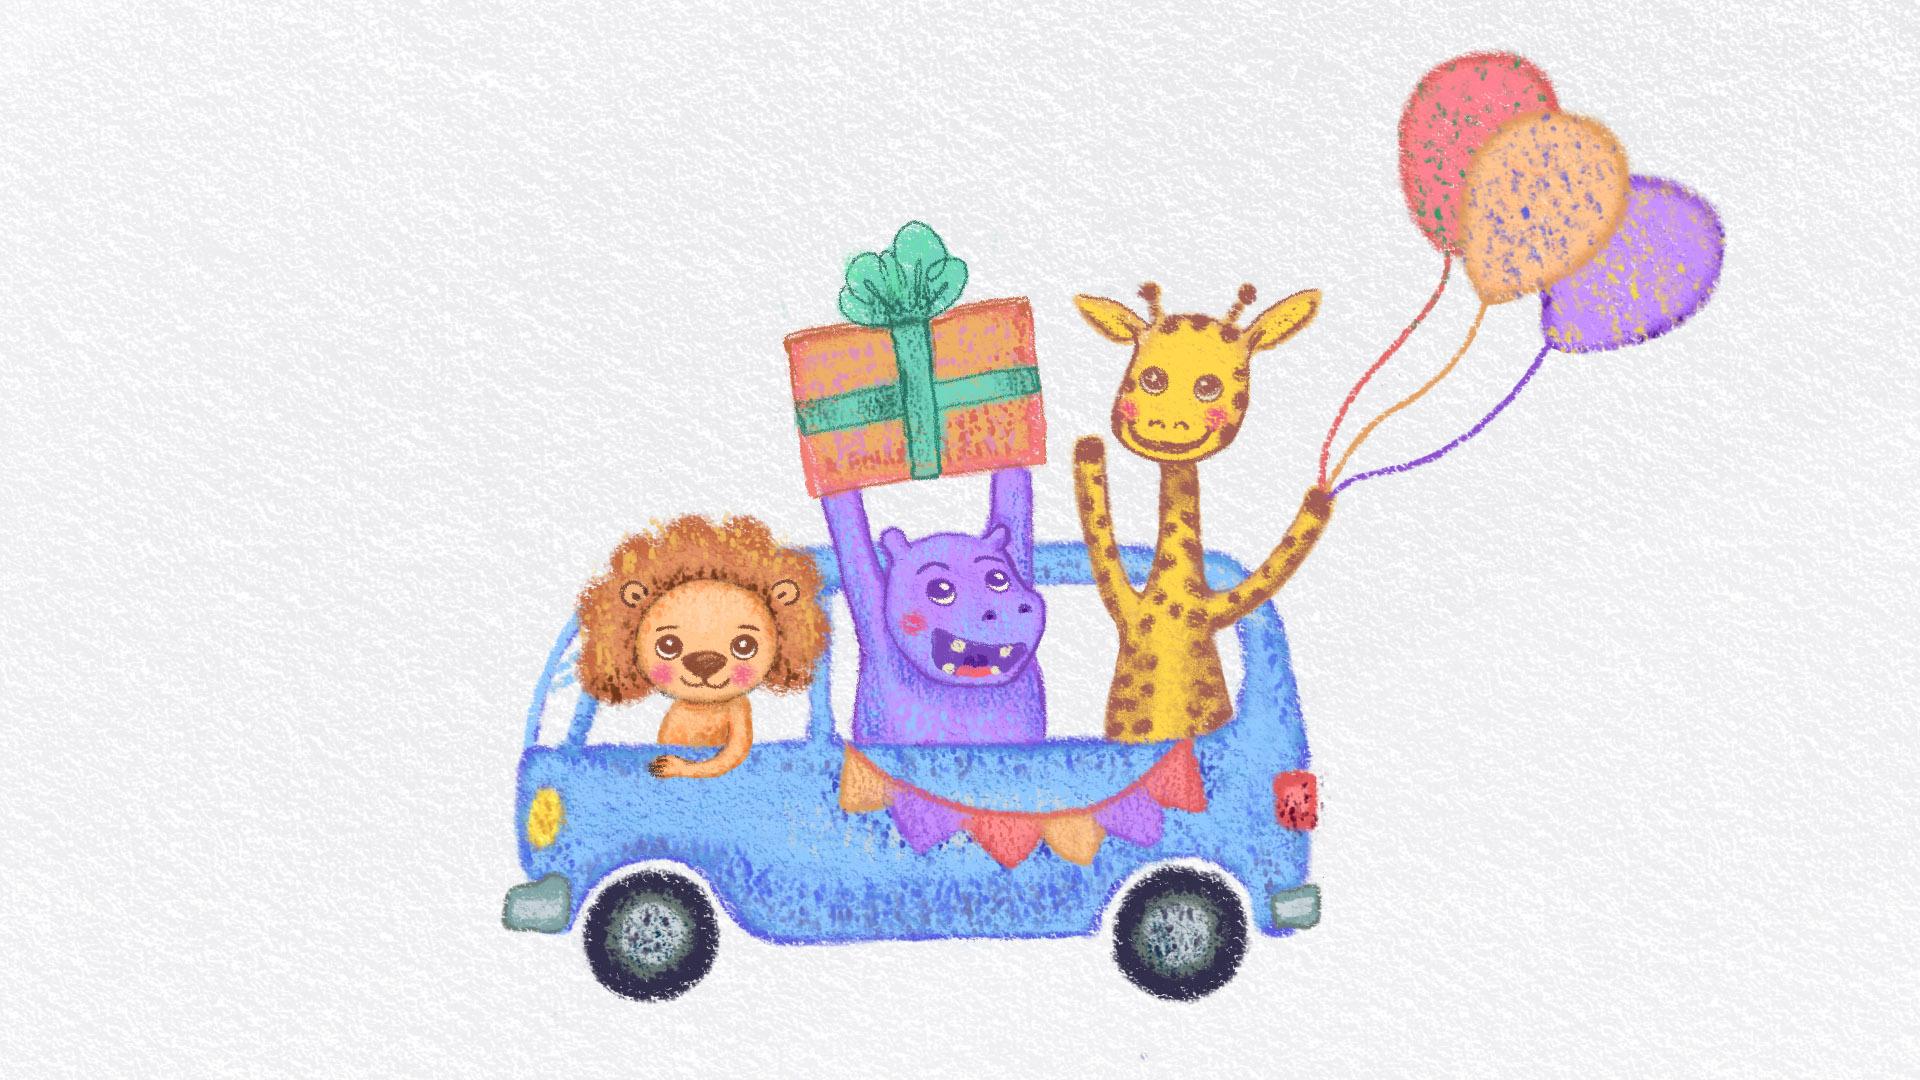 Animated happy birthday card, Procreate, 2020